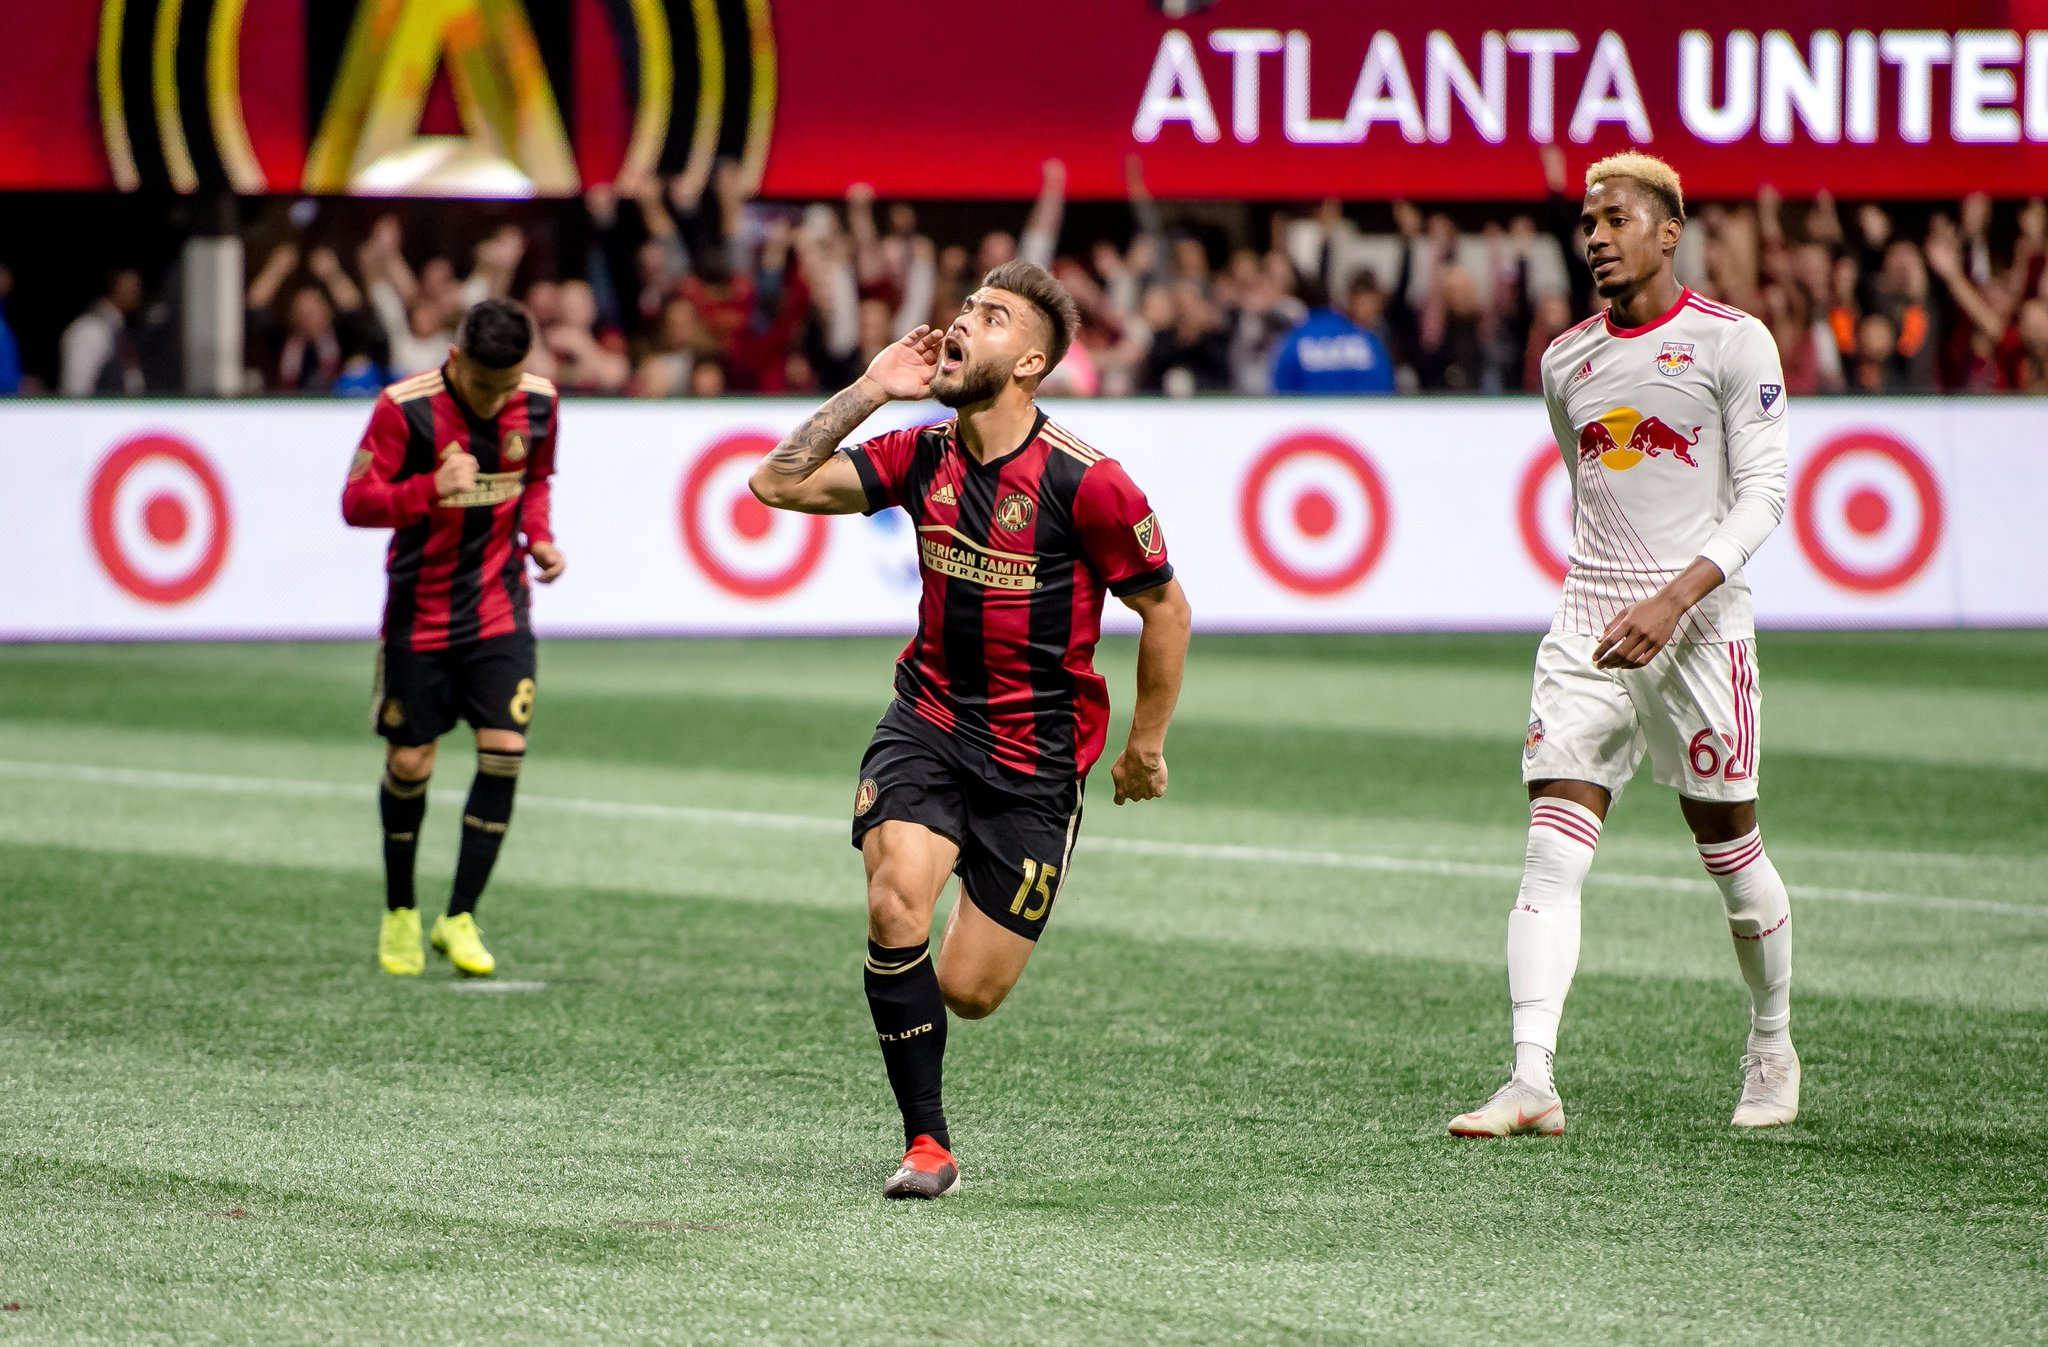 Atlanta United destroy the New York Red Bulls